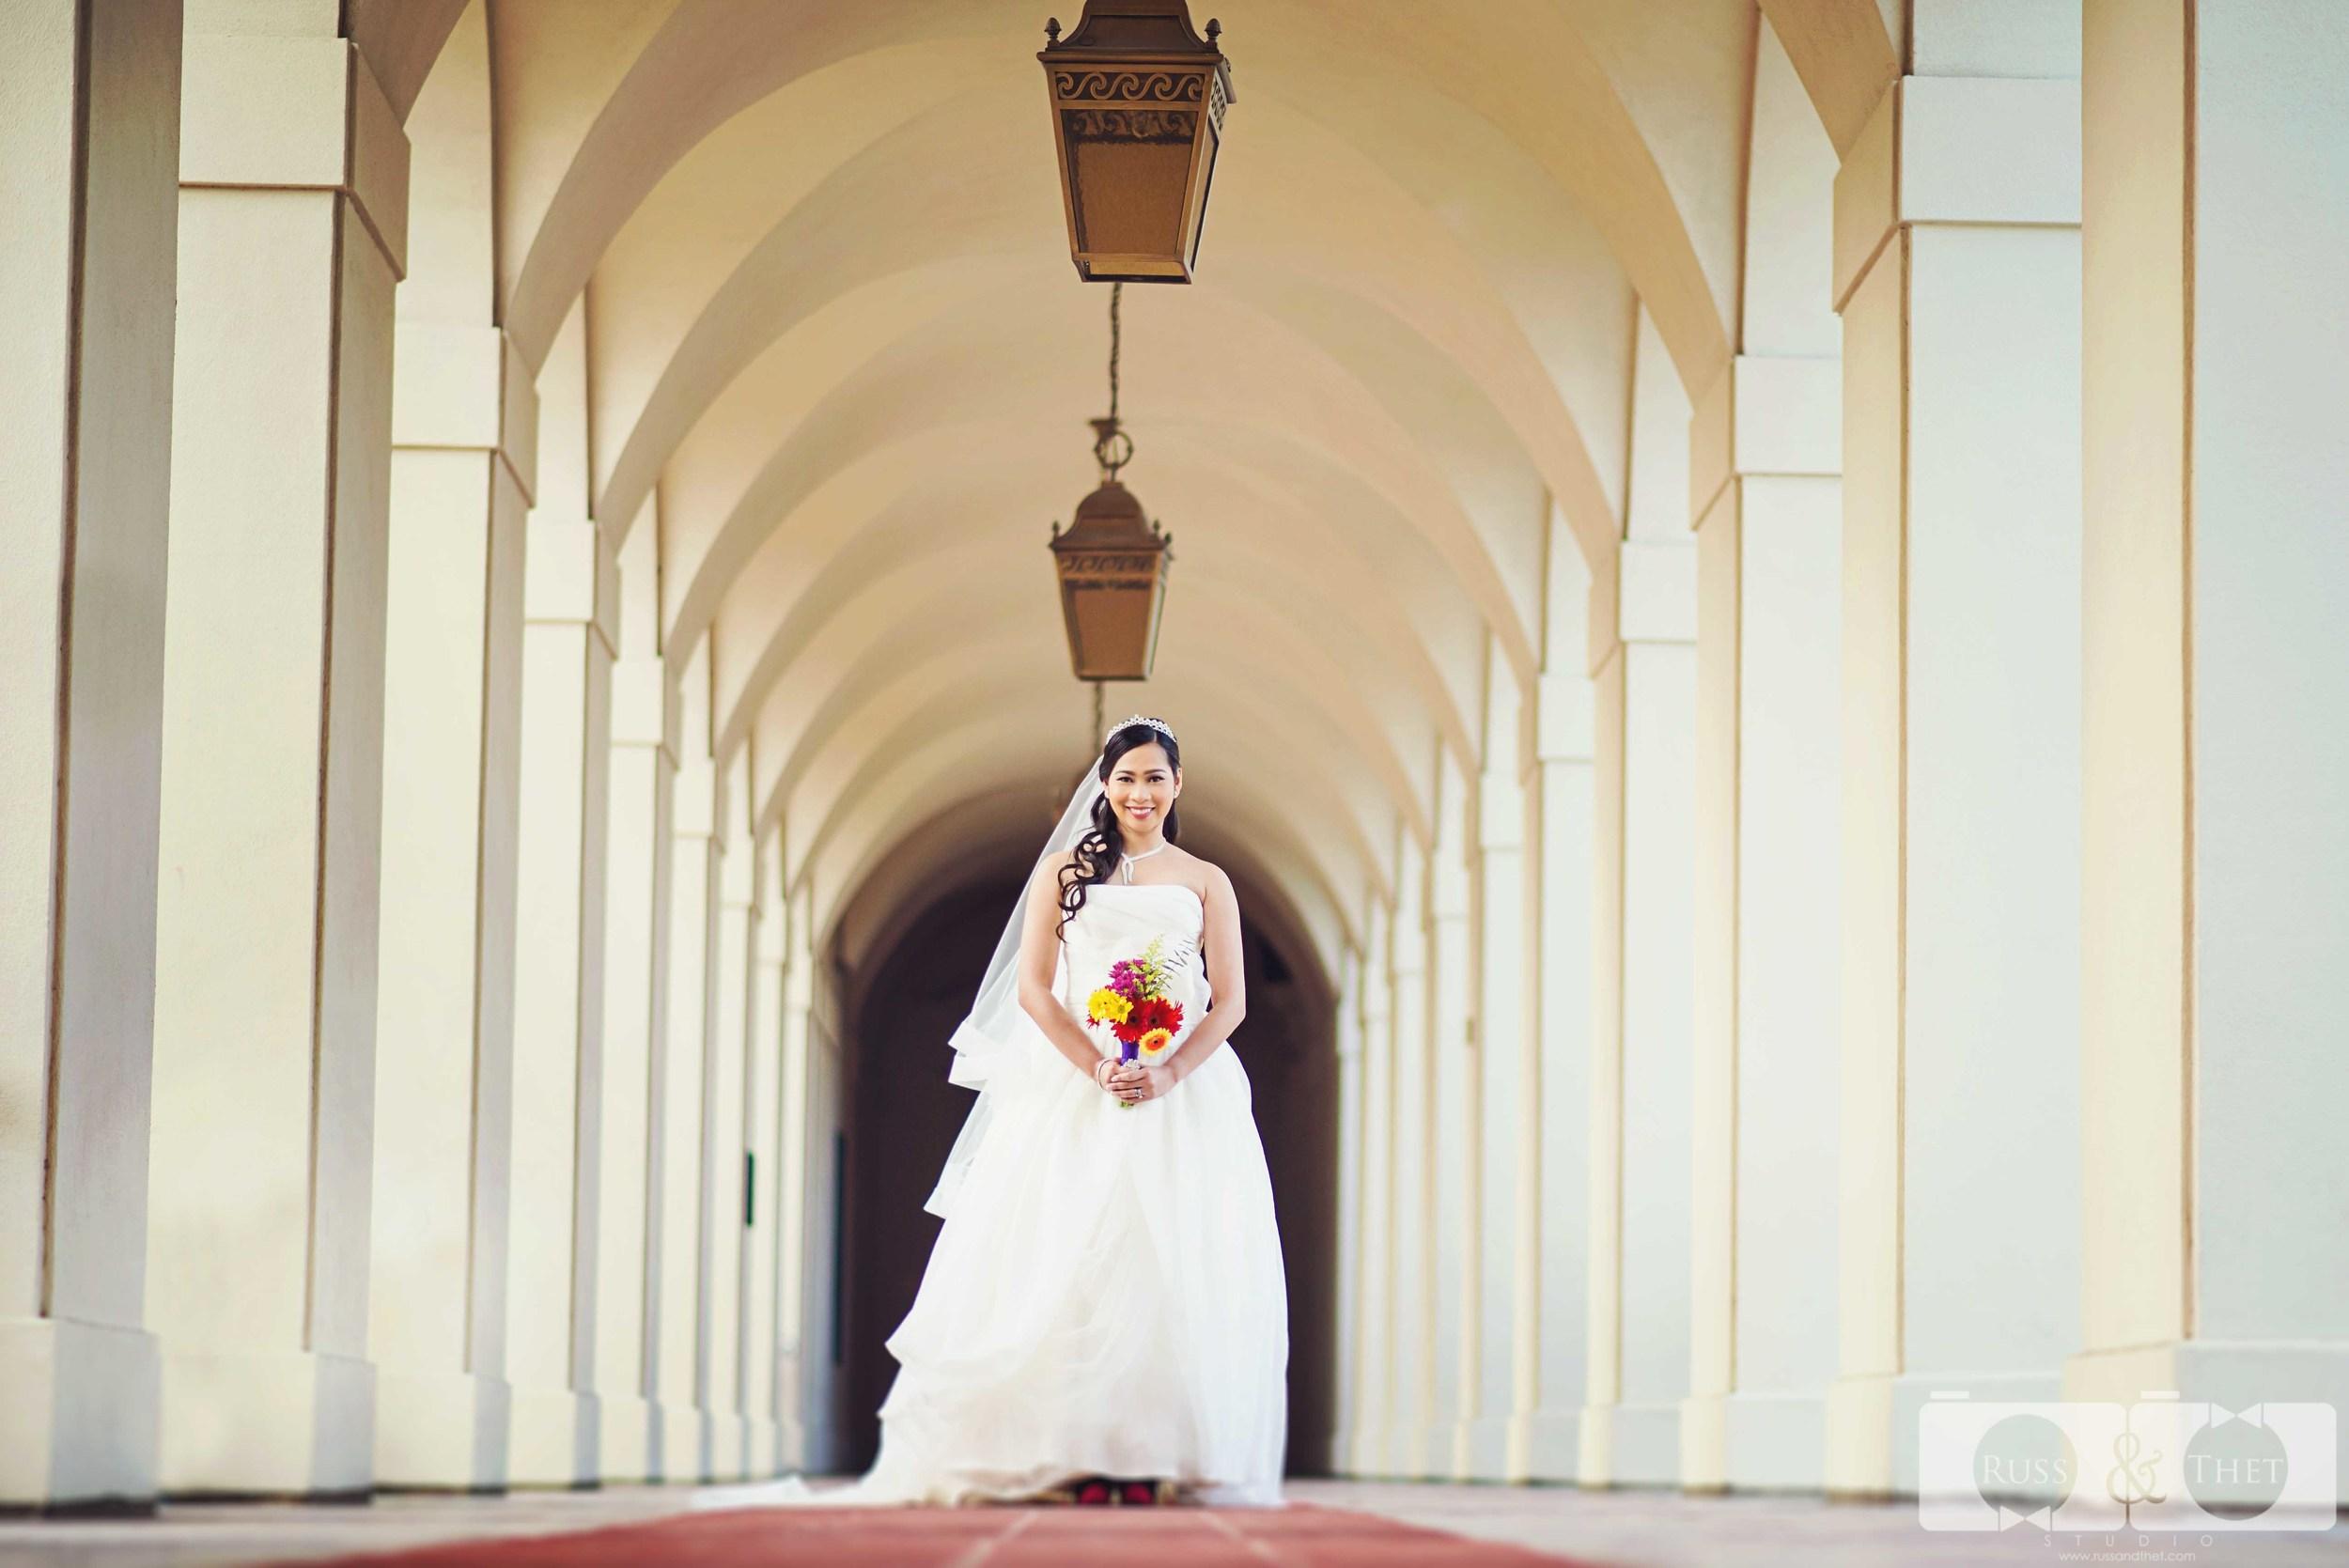 royal-palace-banquet-hall-glendale-wedding-11.JPG